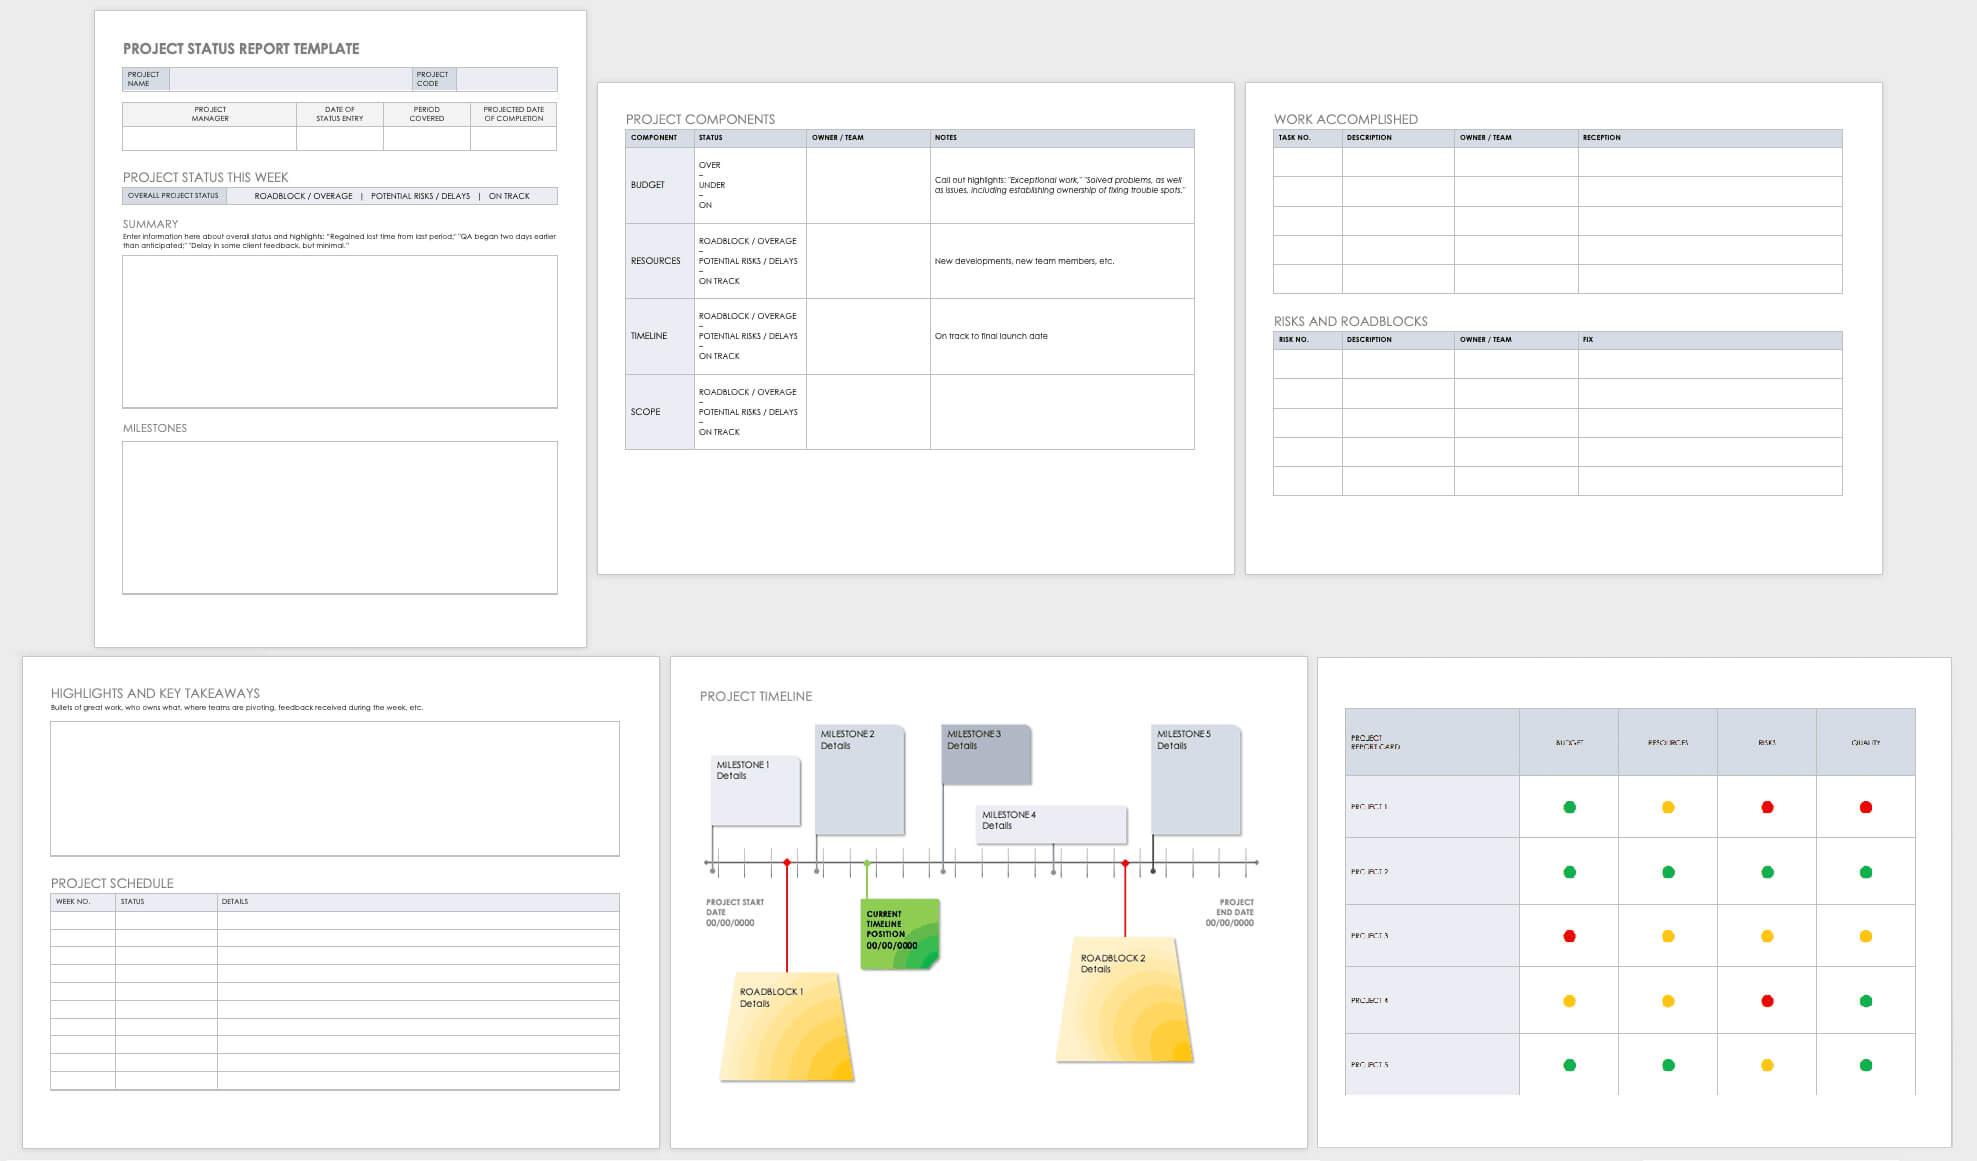 Free Project Report Templates | Smartsheet Regarding Project Management Final Report Template